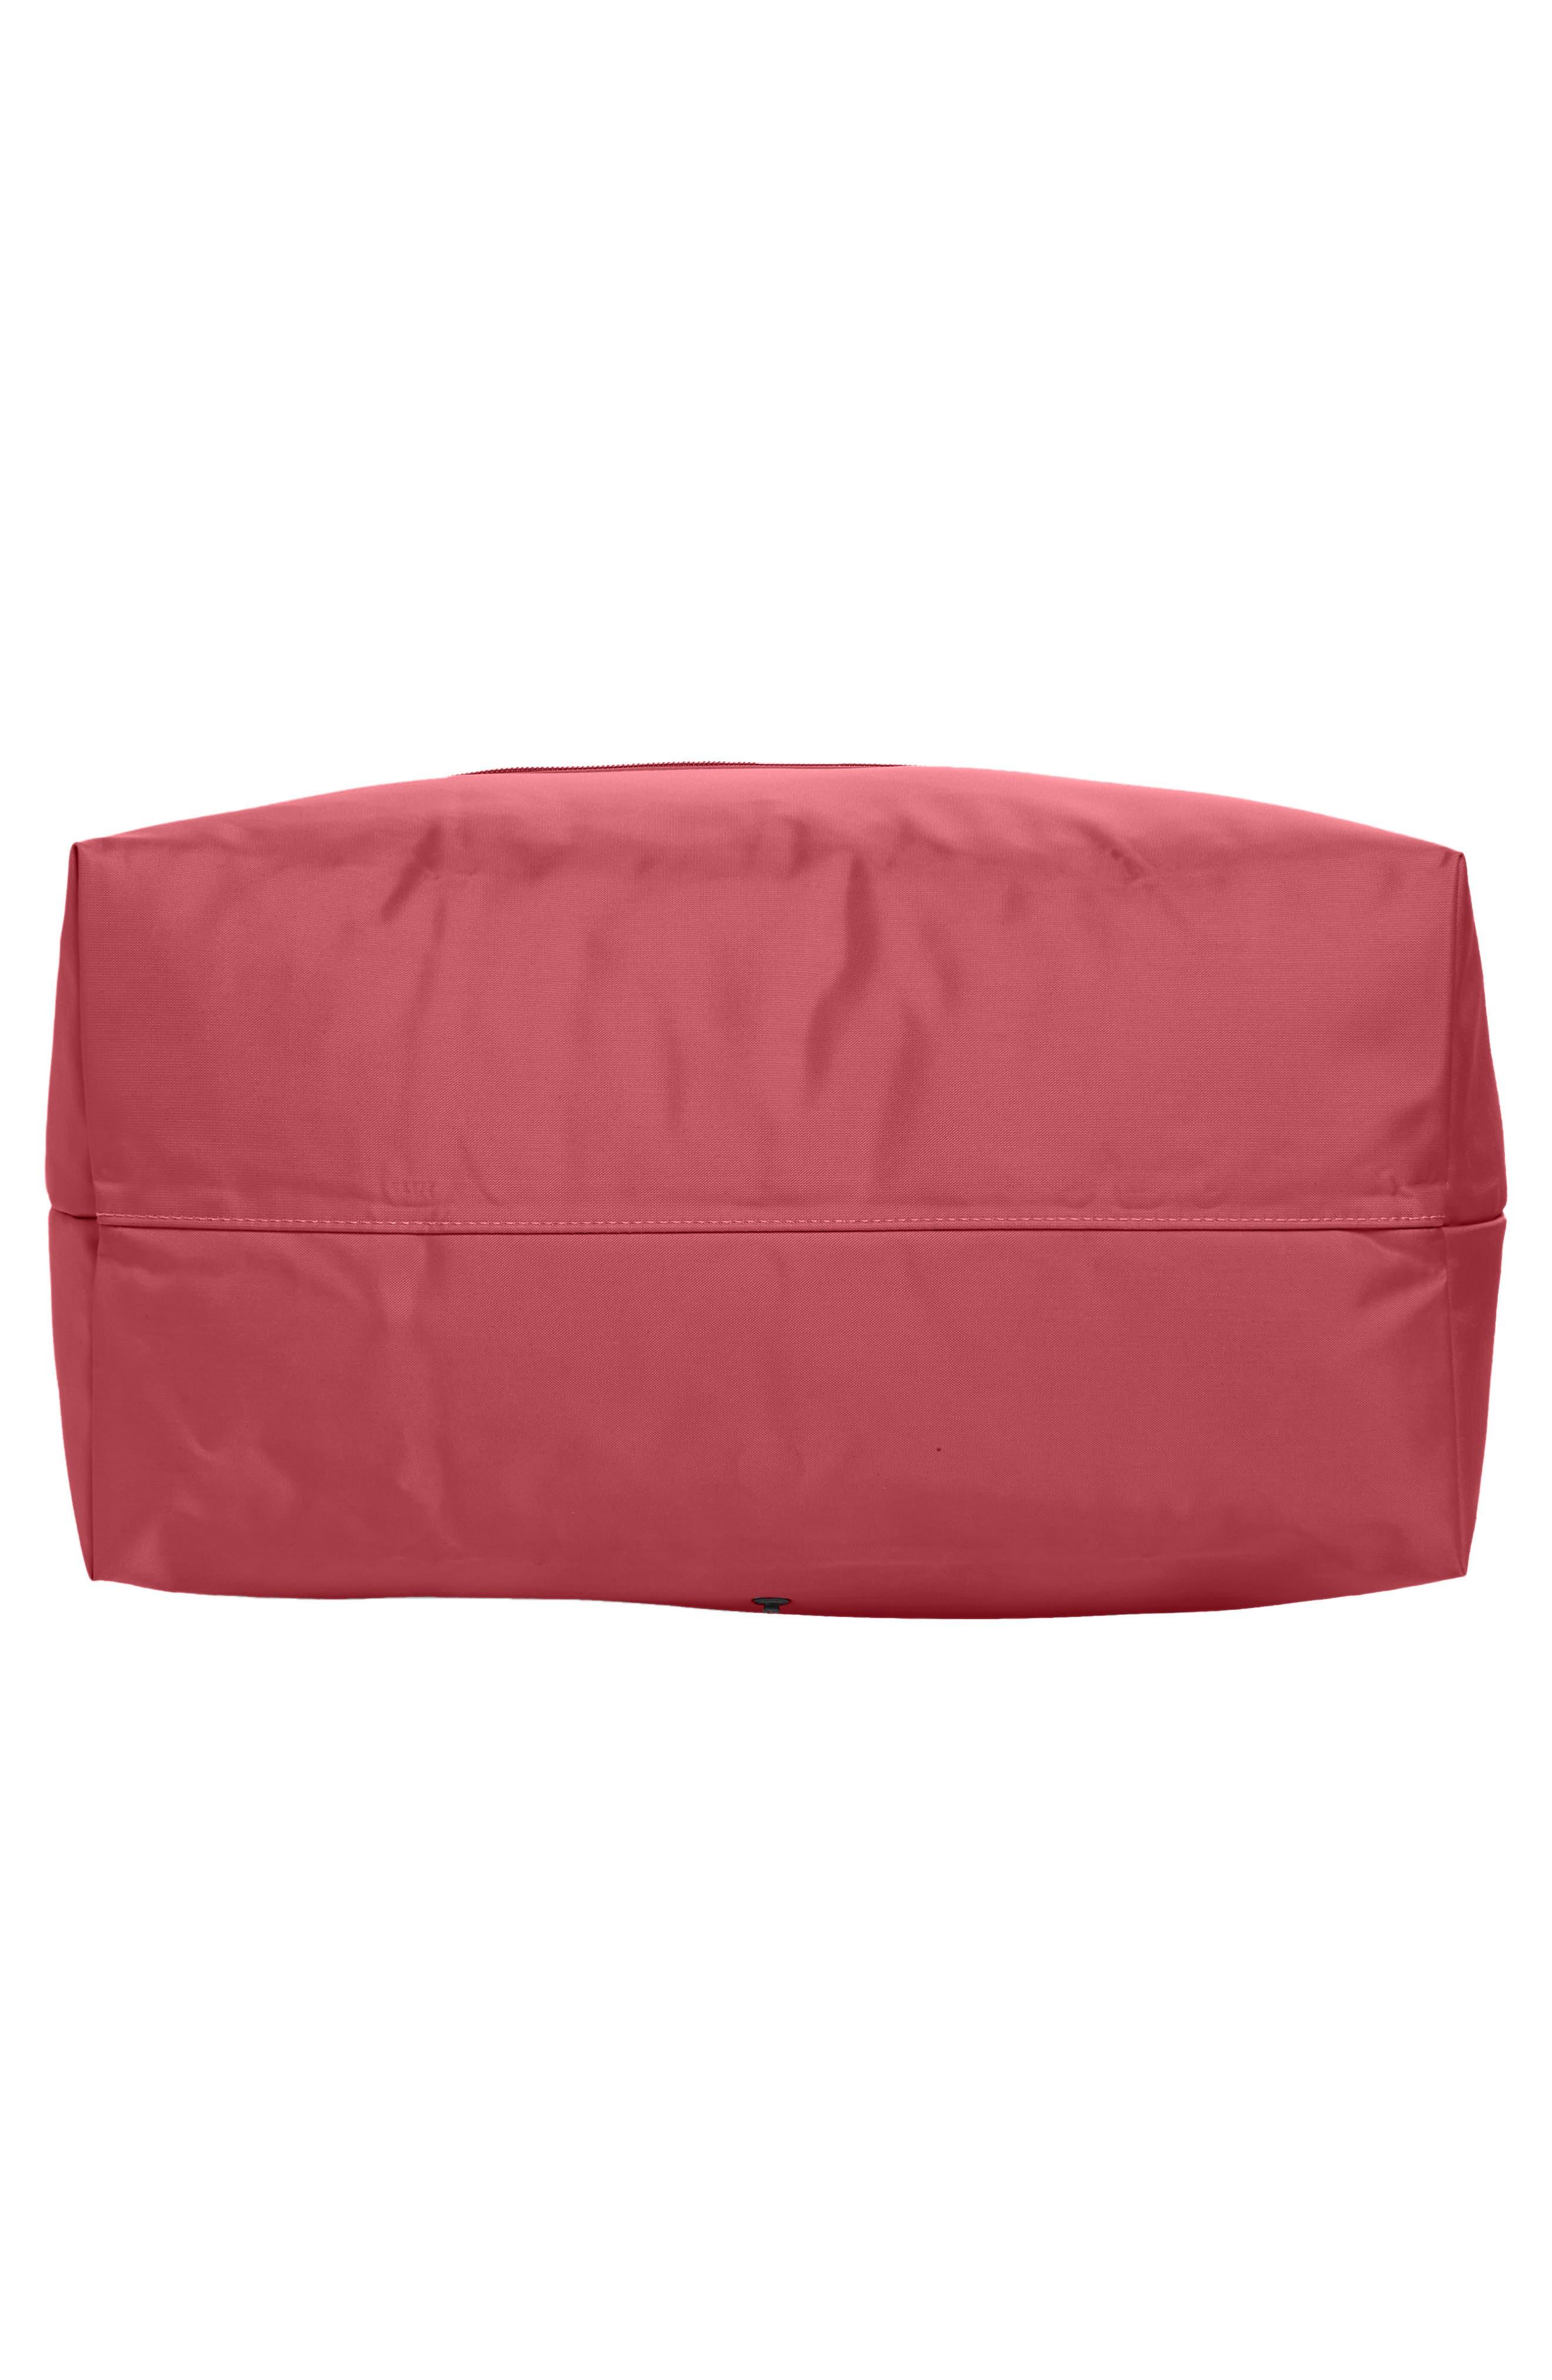 Le Pliage 21-Inch Expandable Travel Bag,                             Alternate thumbnail 6, color,                             FIG